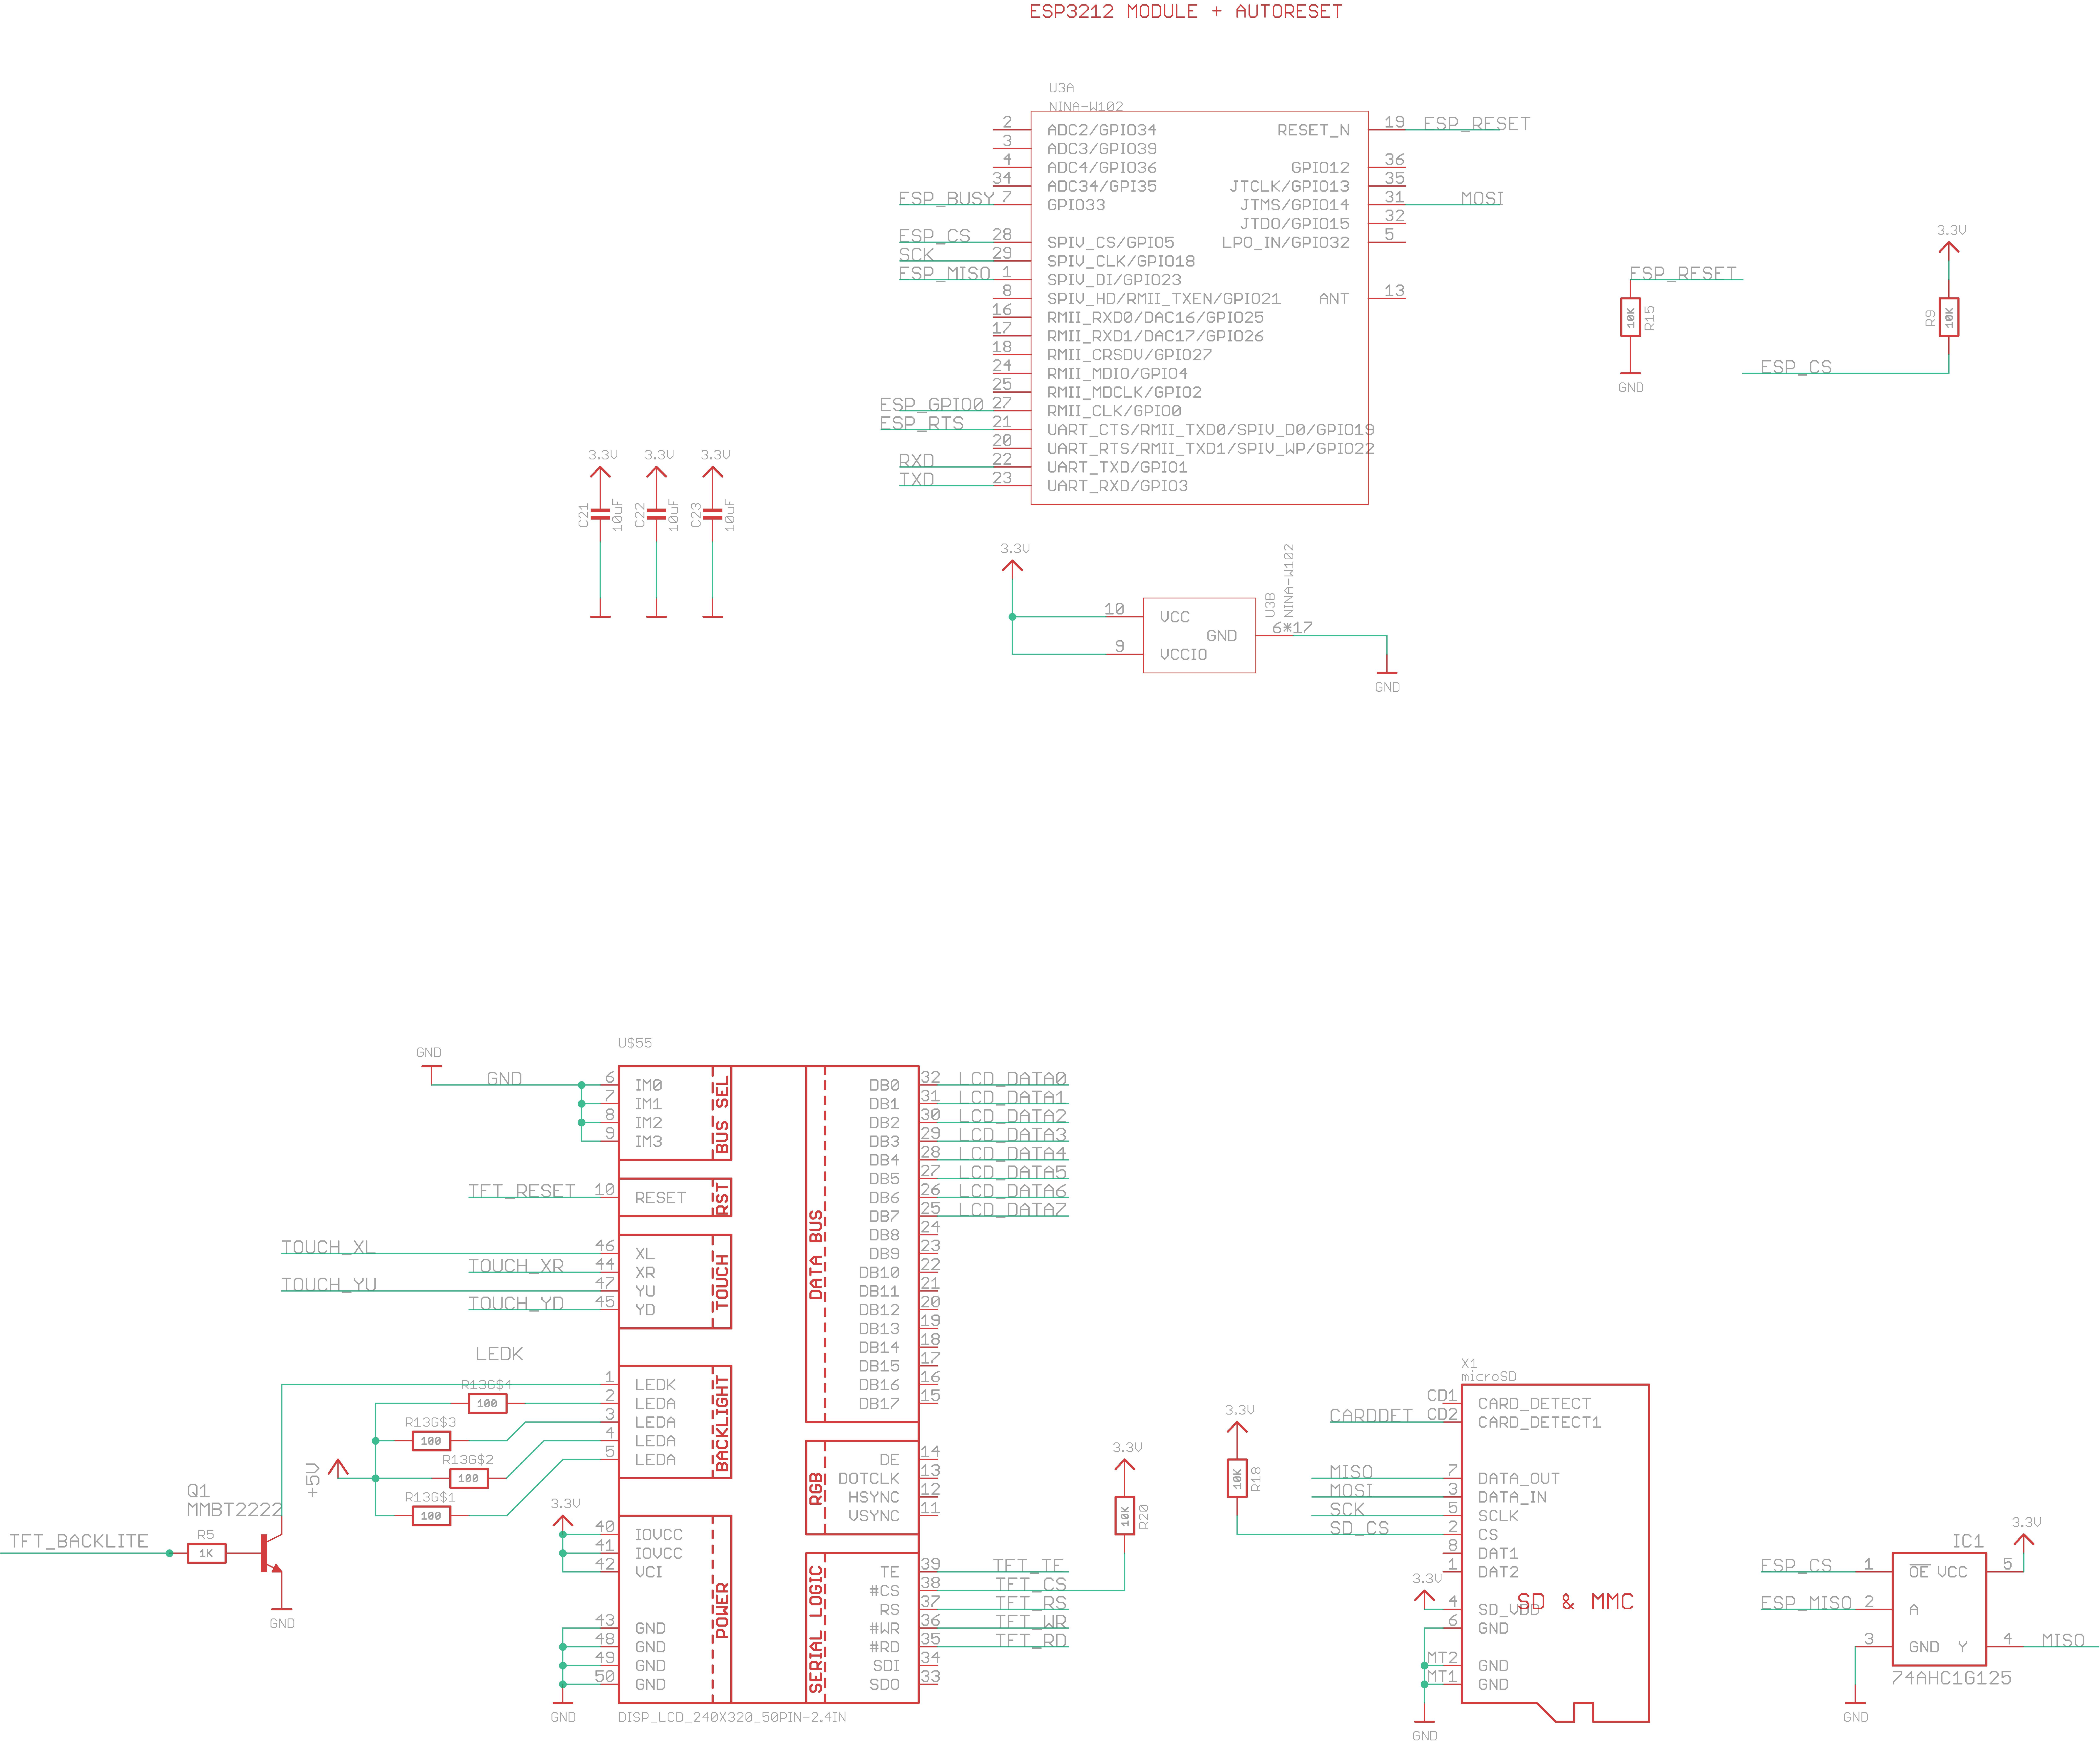 circuitpython_PyPortal_Pynt_Sch_p2.png